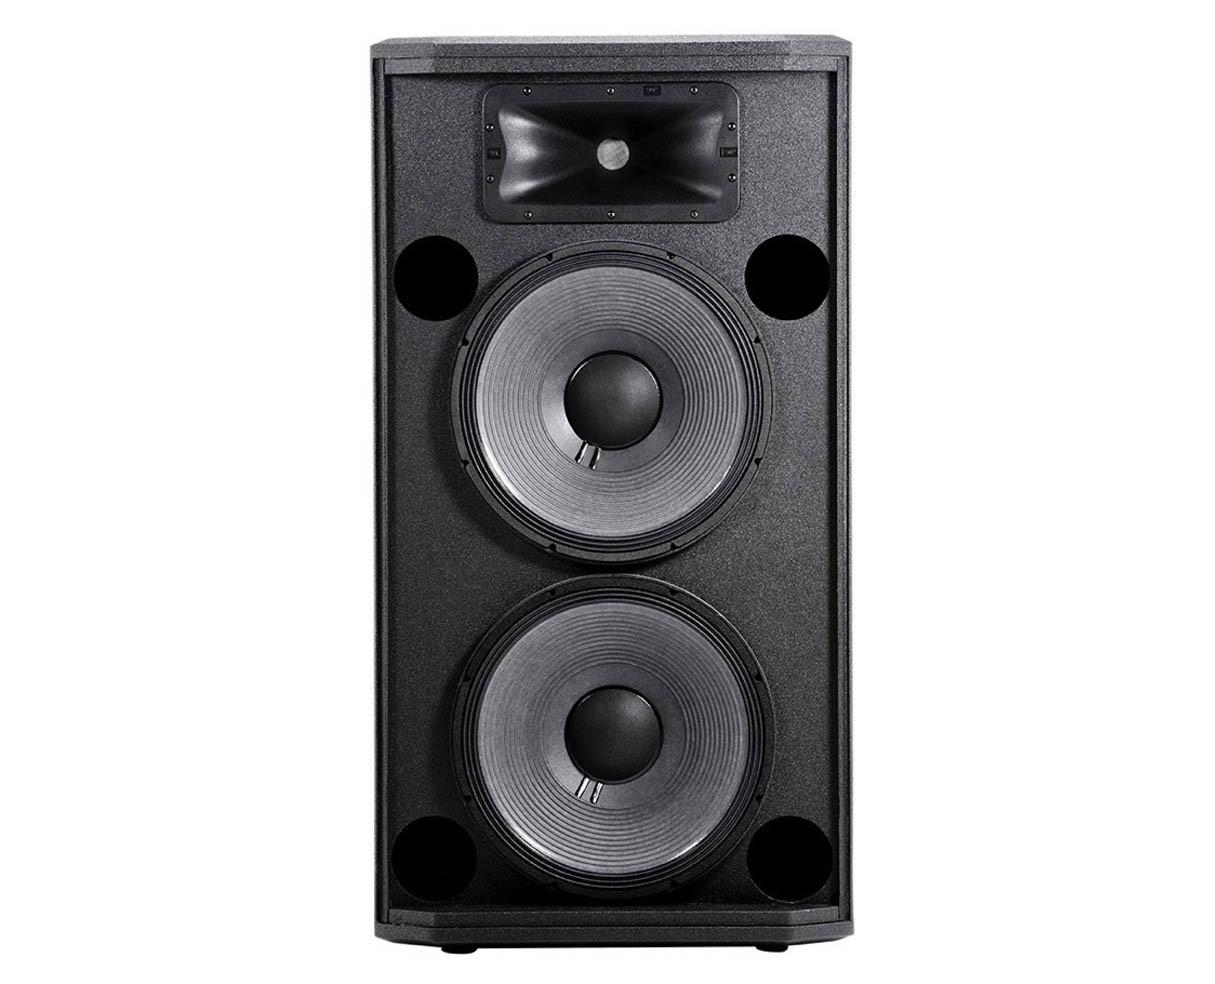 Jbl Stx825 Dual 15 Inch 2 Way Passive Speaker Cabinet